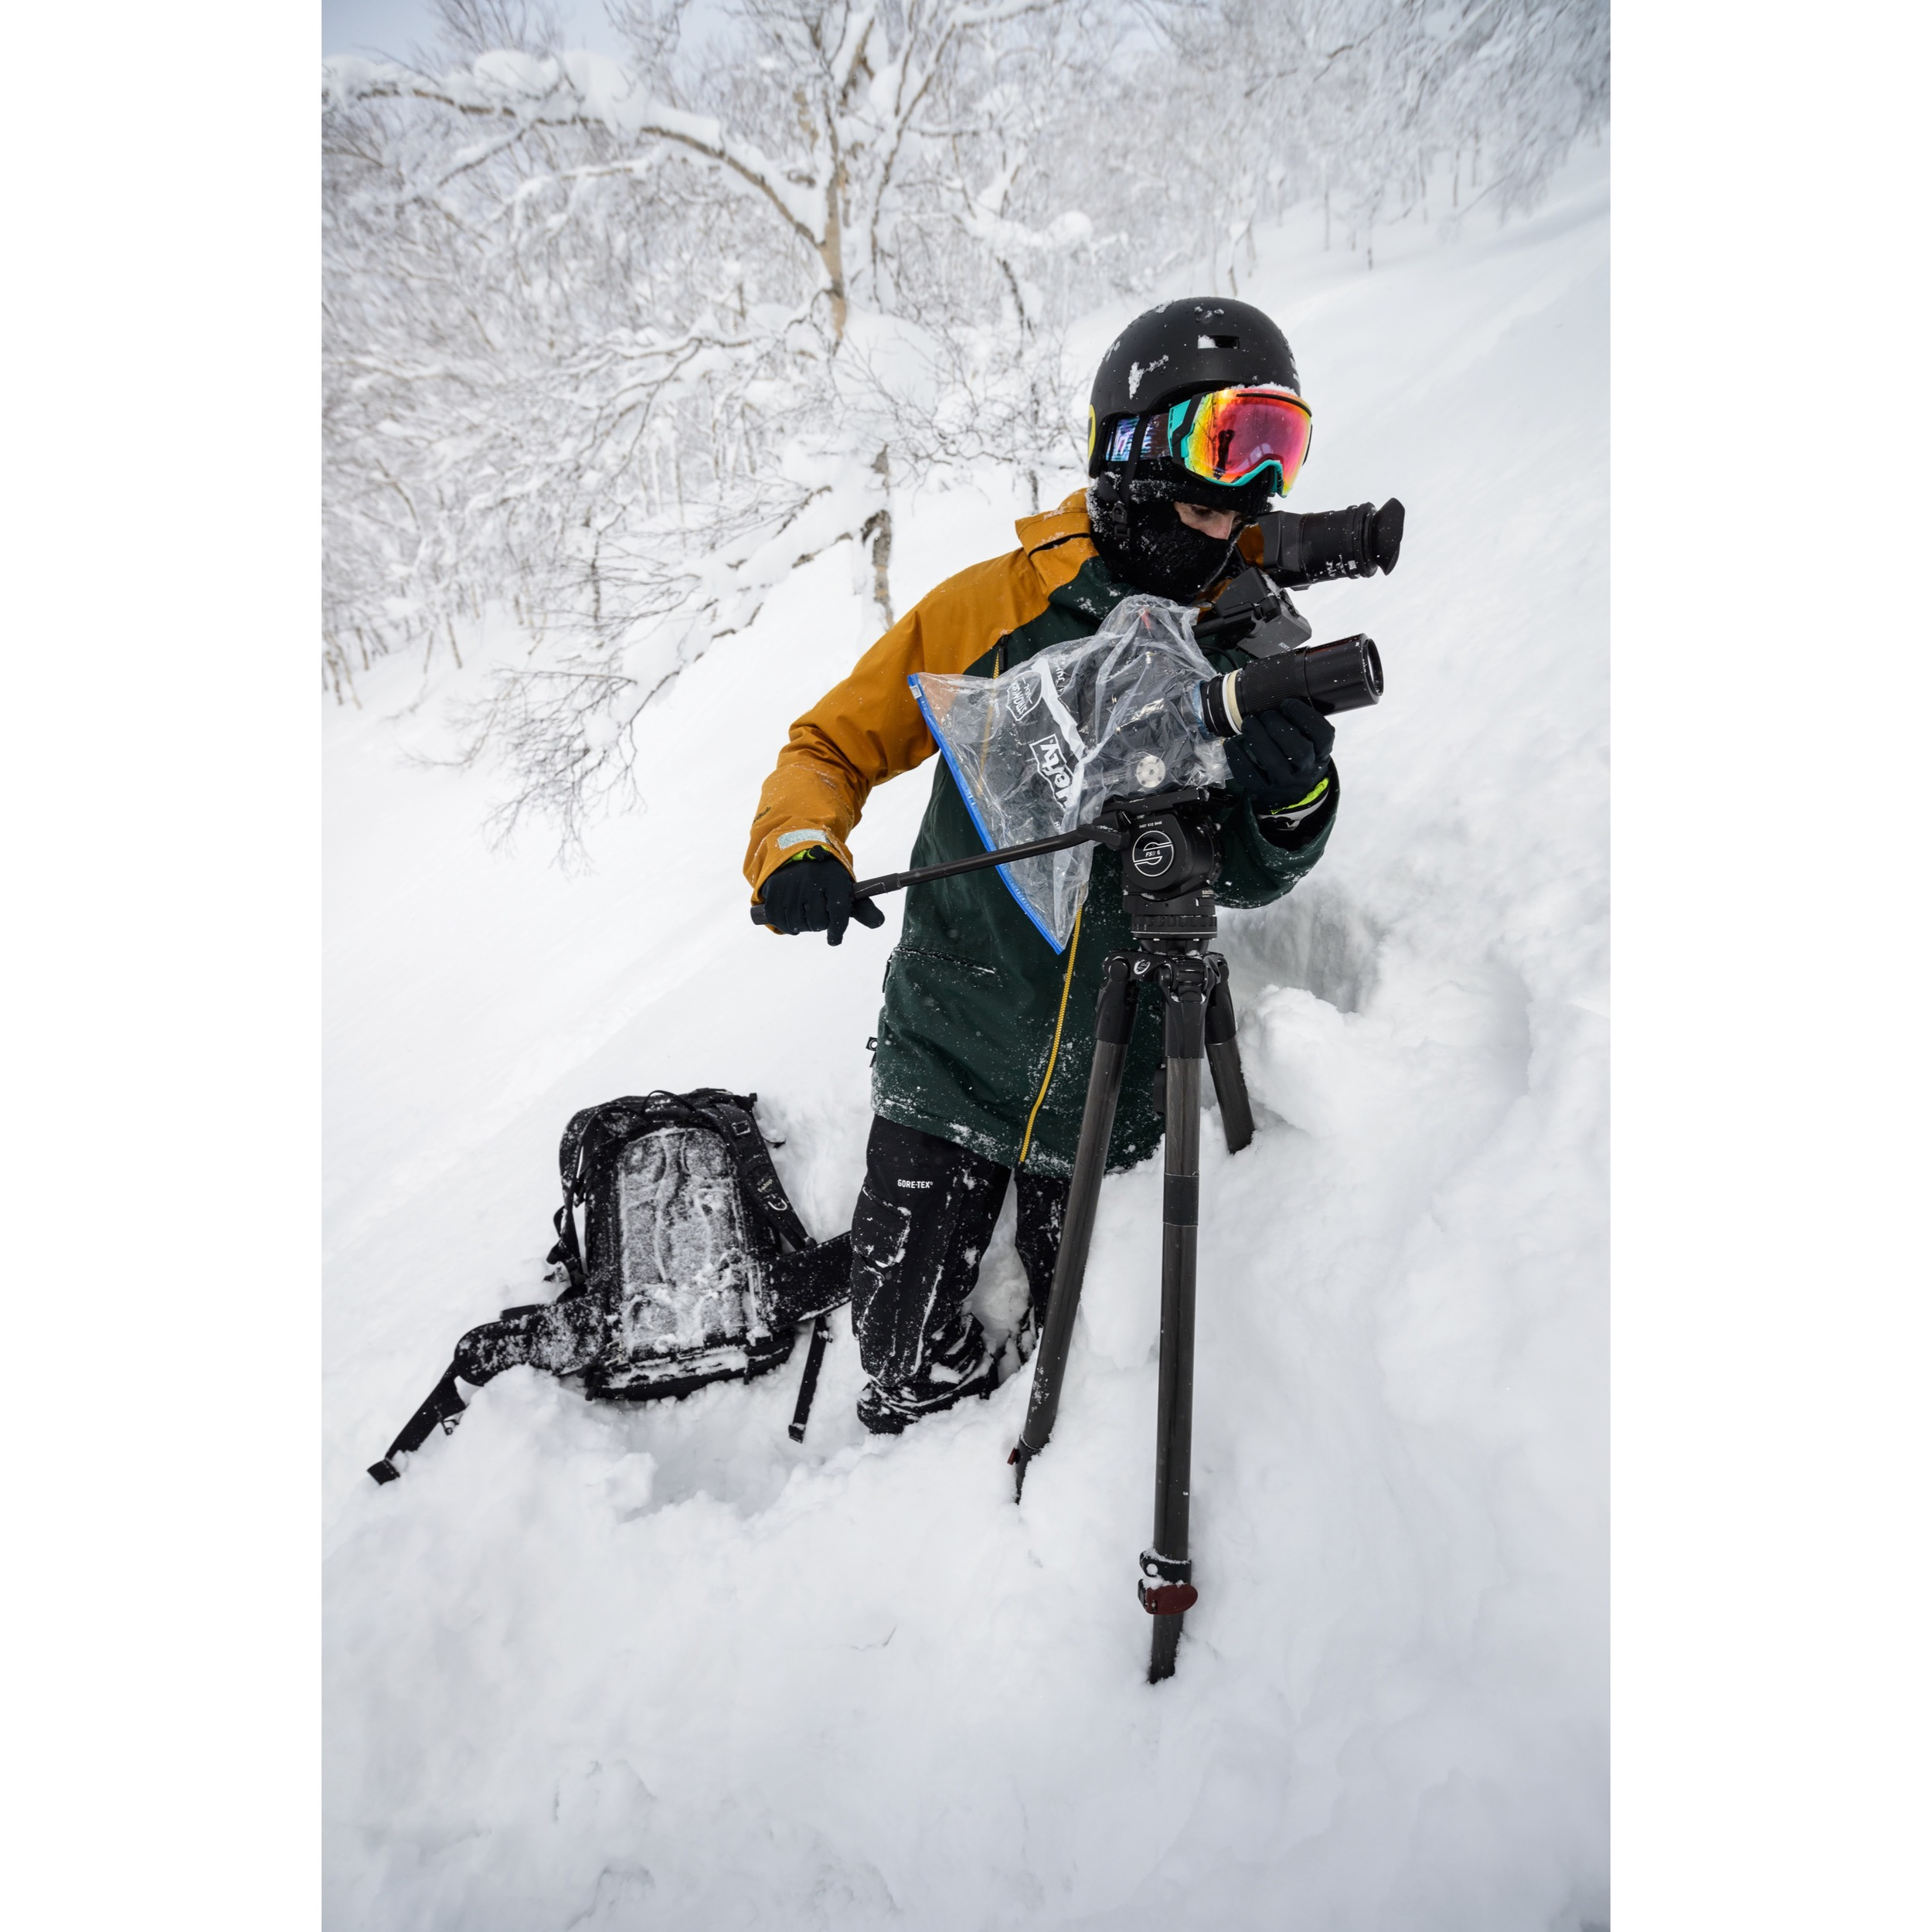 Filming in the trees at Rusutsu Ski Resort in Japan